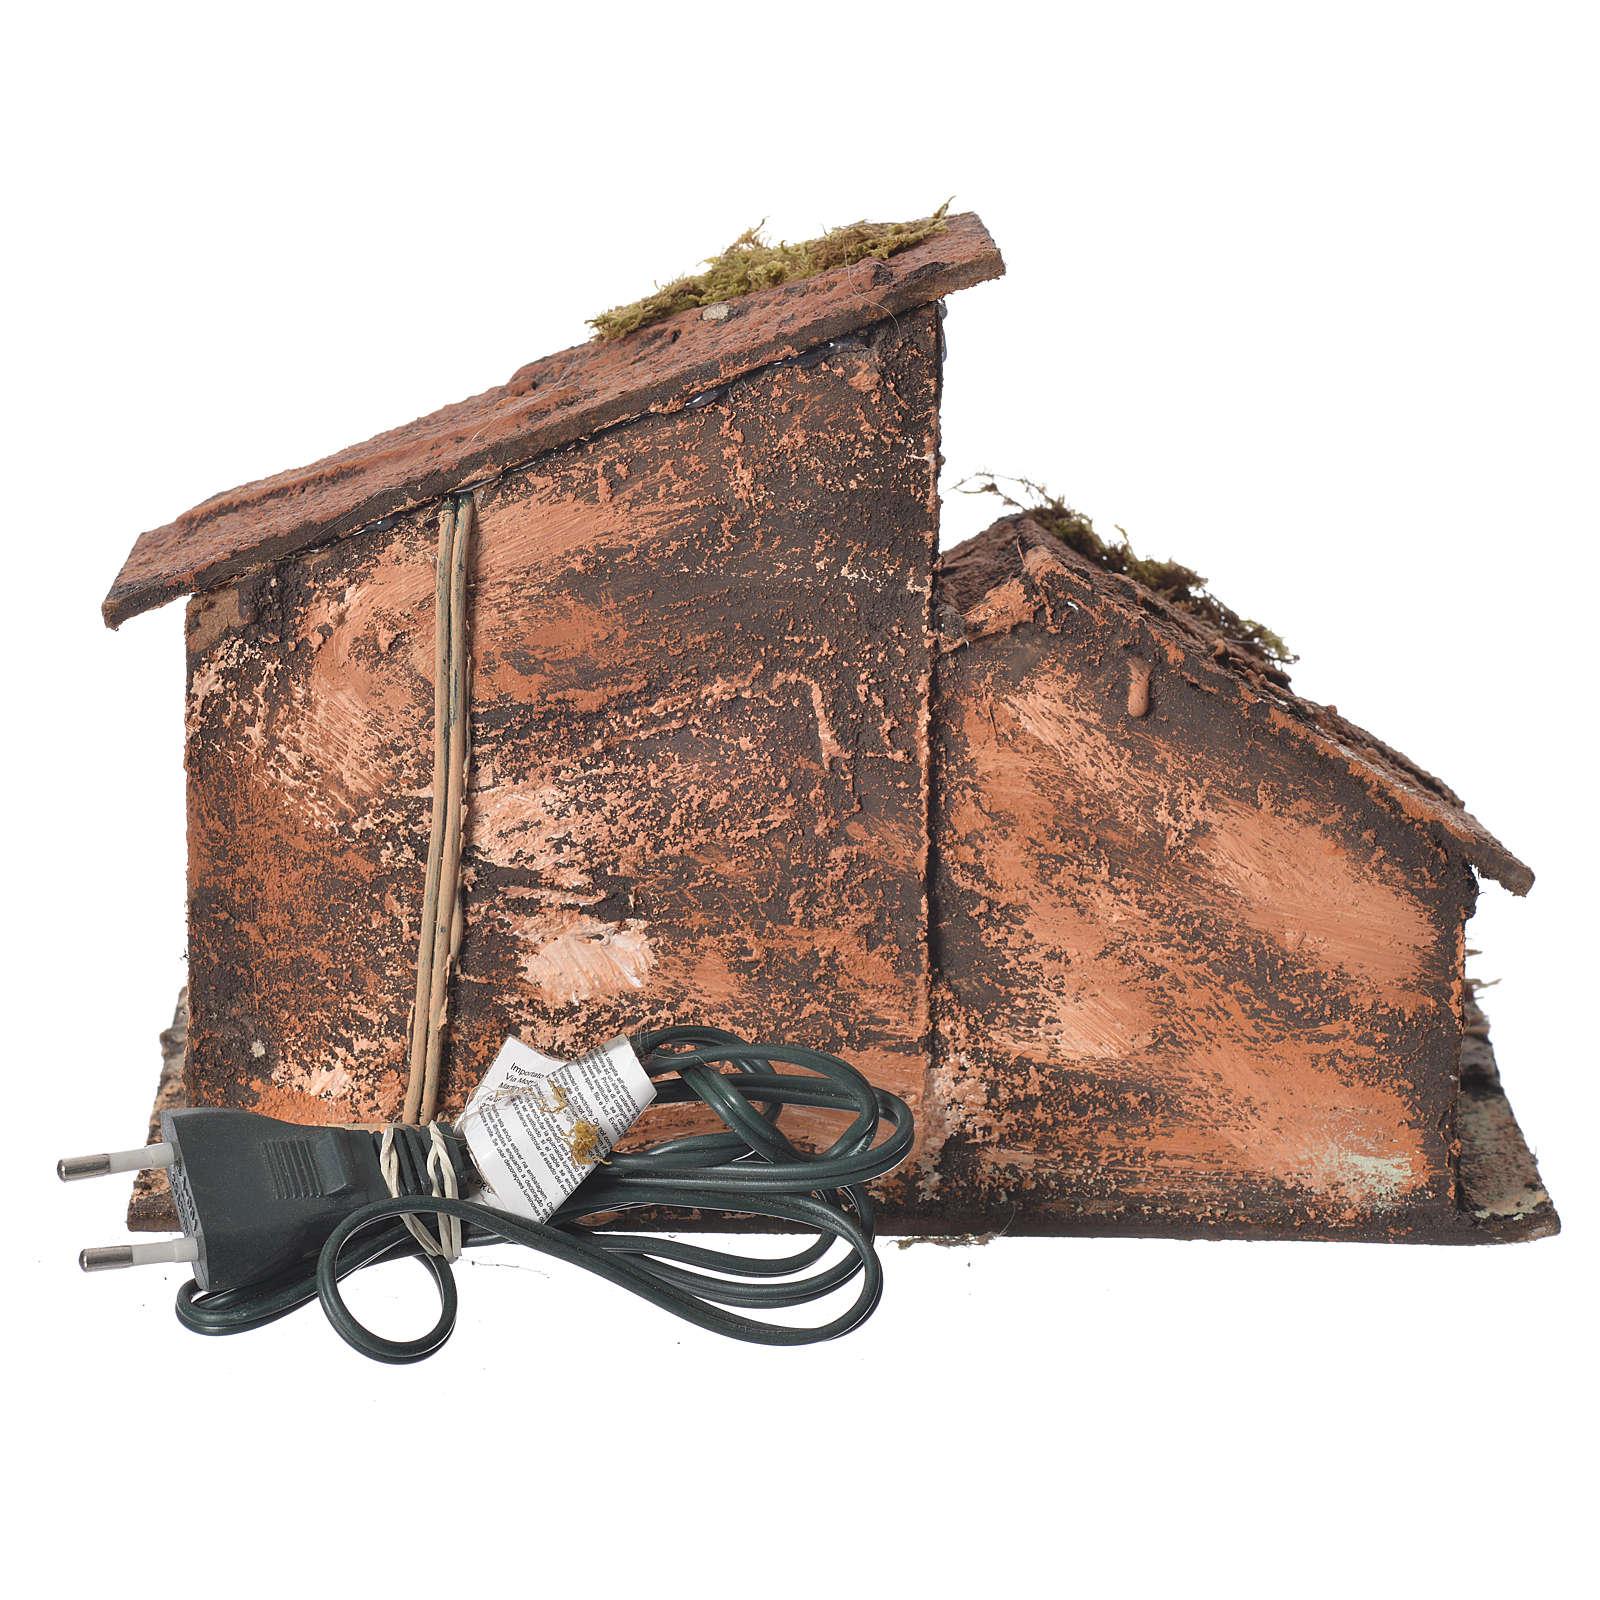 Wooden stable, Neapolitan Nativity 16X24X14cm 4